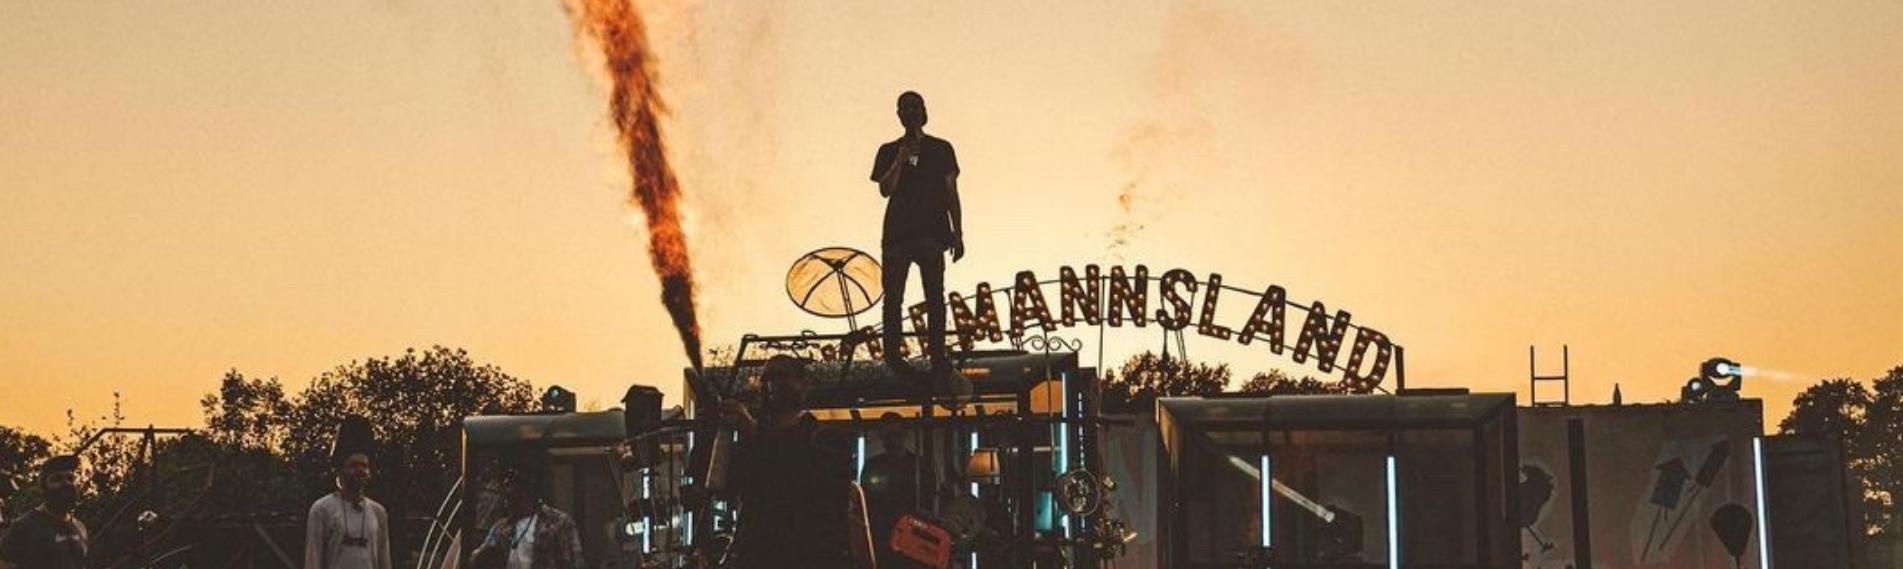 Burning Man Feeling in Kliemannsland – Adam Hall supports Livestream with Ben Böhmer